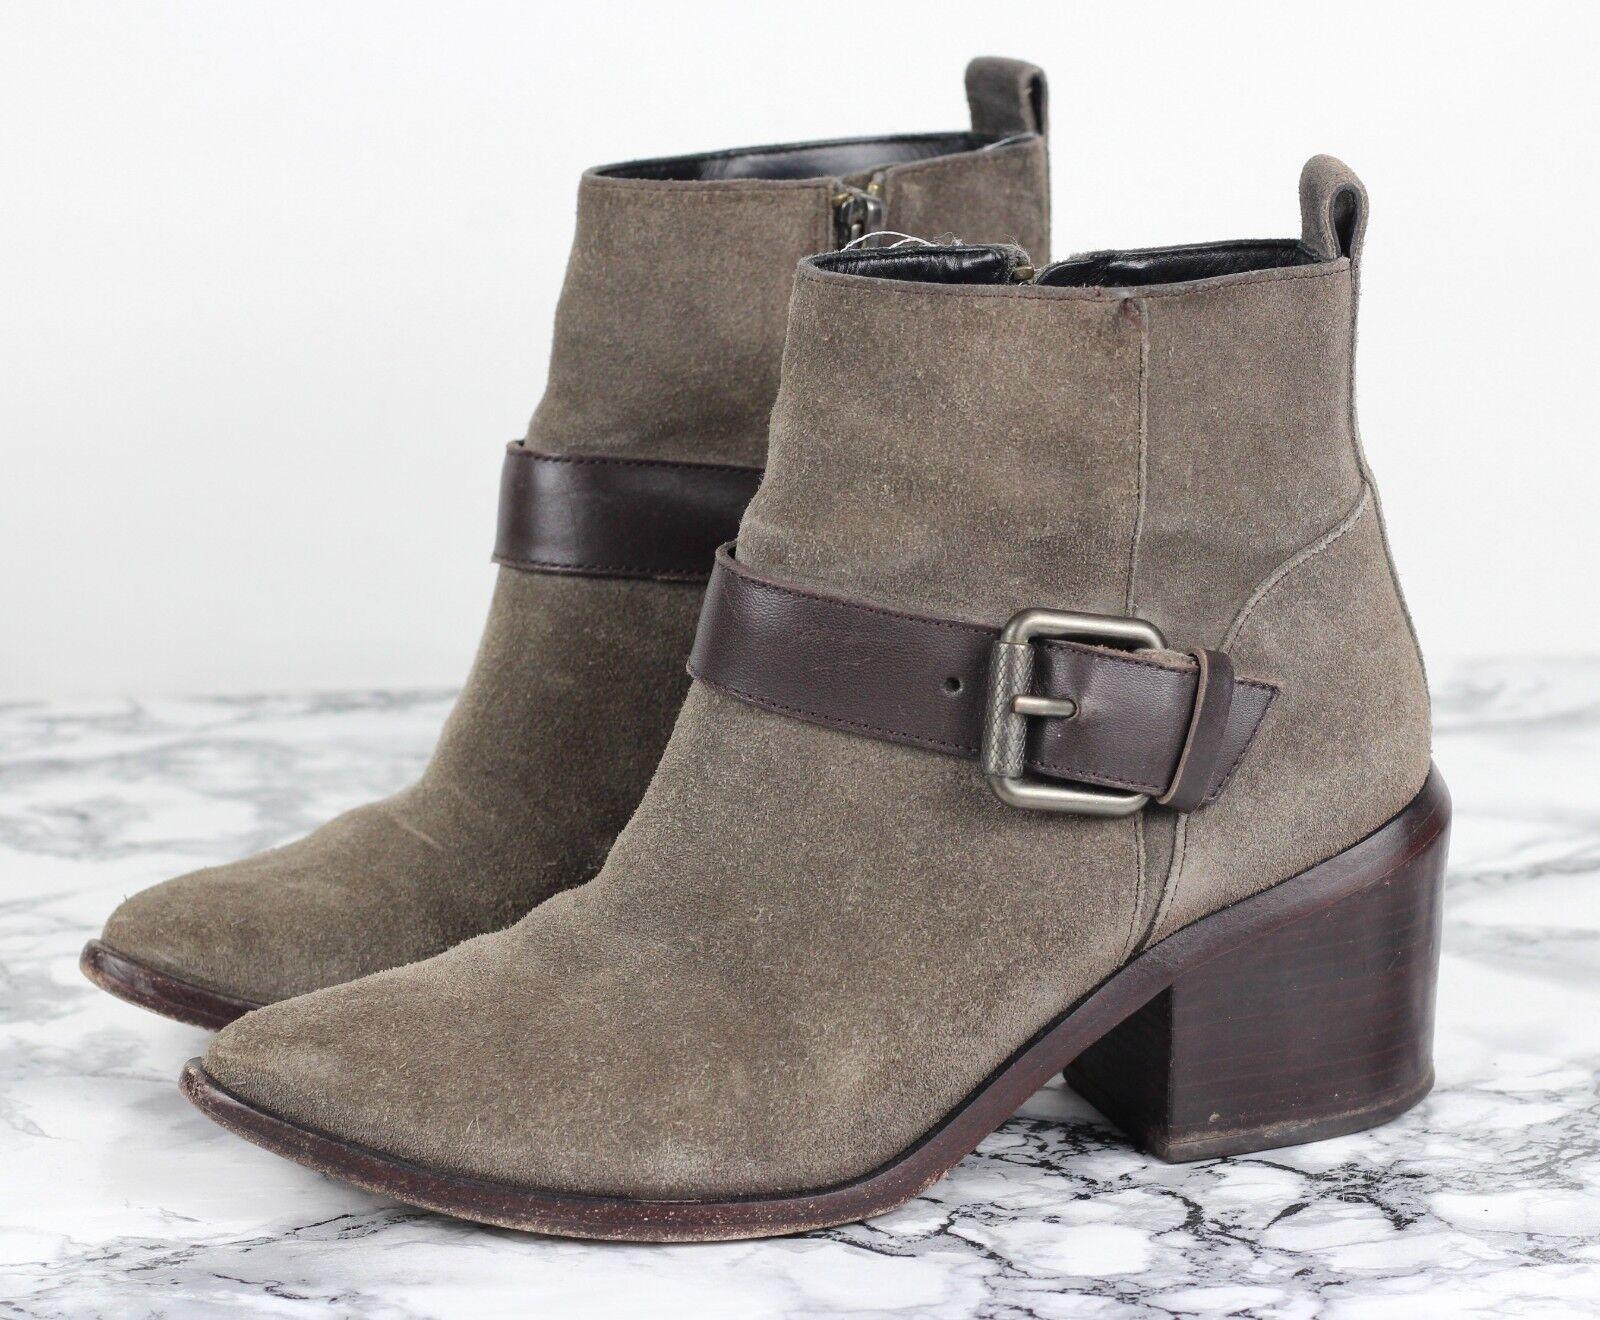 ALL SAINTS Beige Suede JASON Leather Buckle Ankle Stiefel, Größe EU 38   UK 5